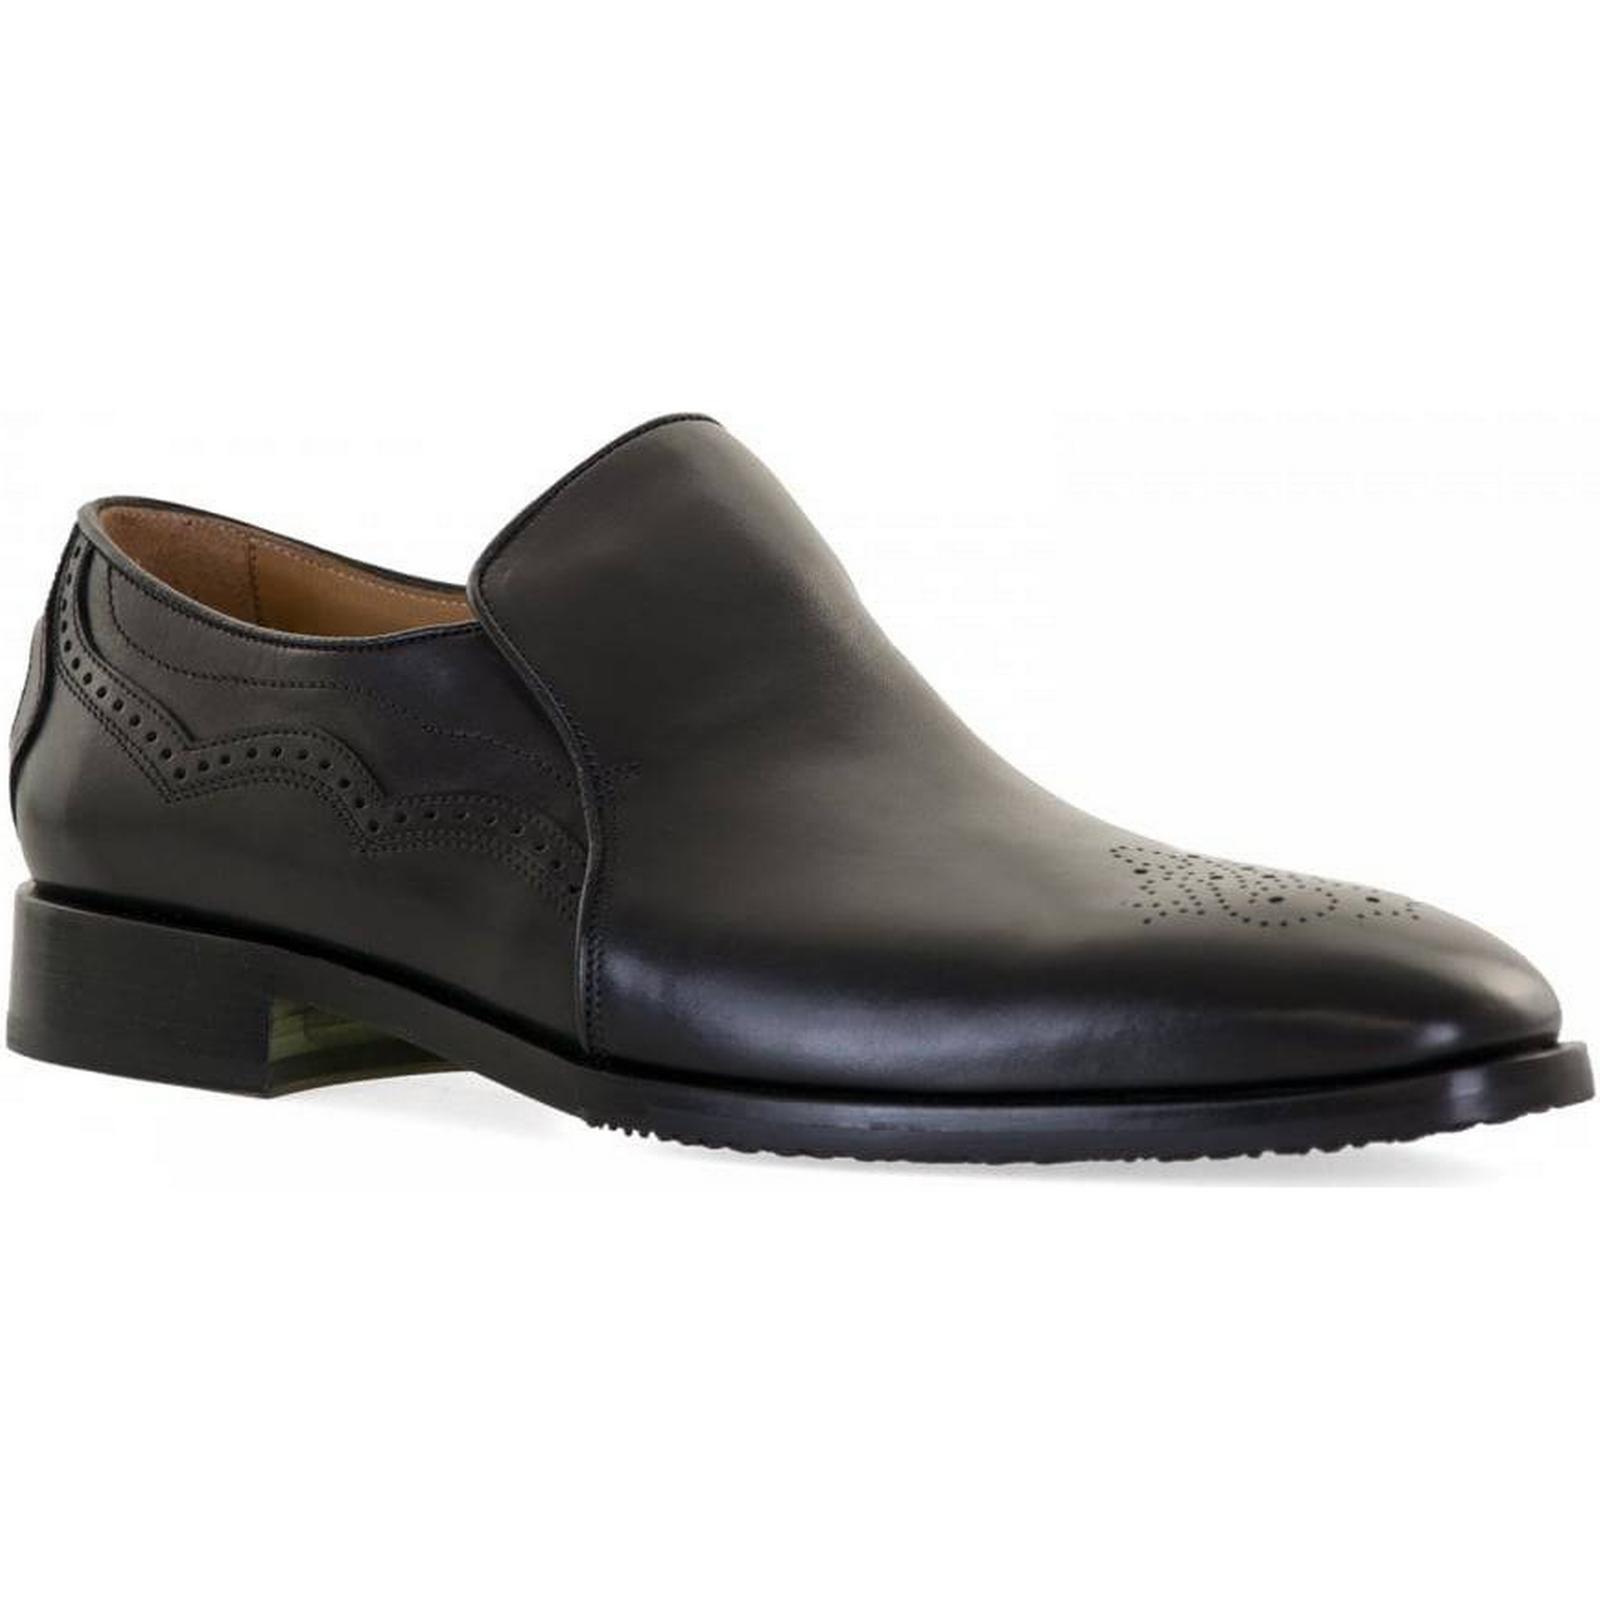 Oliver Sweeney Mens Fermignano 11, Slip On Shoes (Black) Size: 11, Fermignano Colour: 224c45